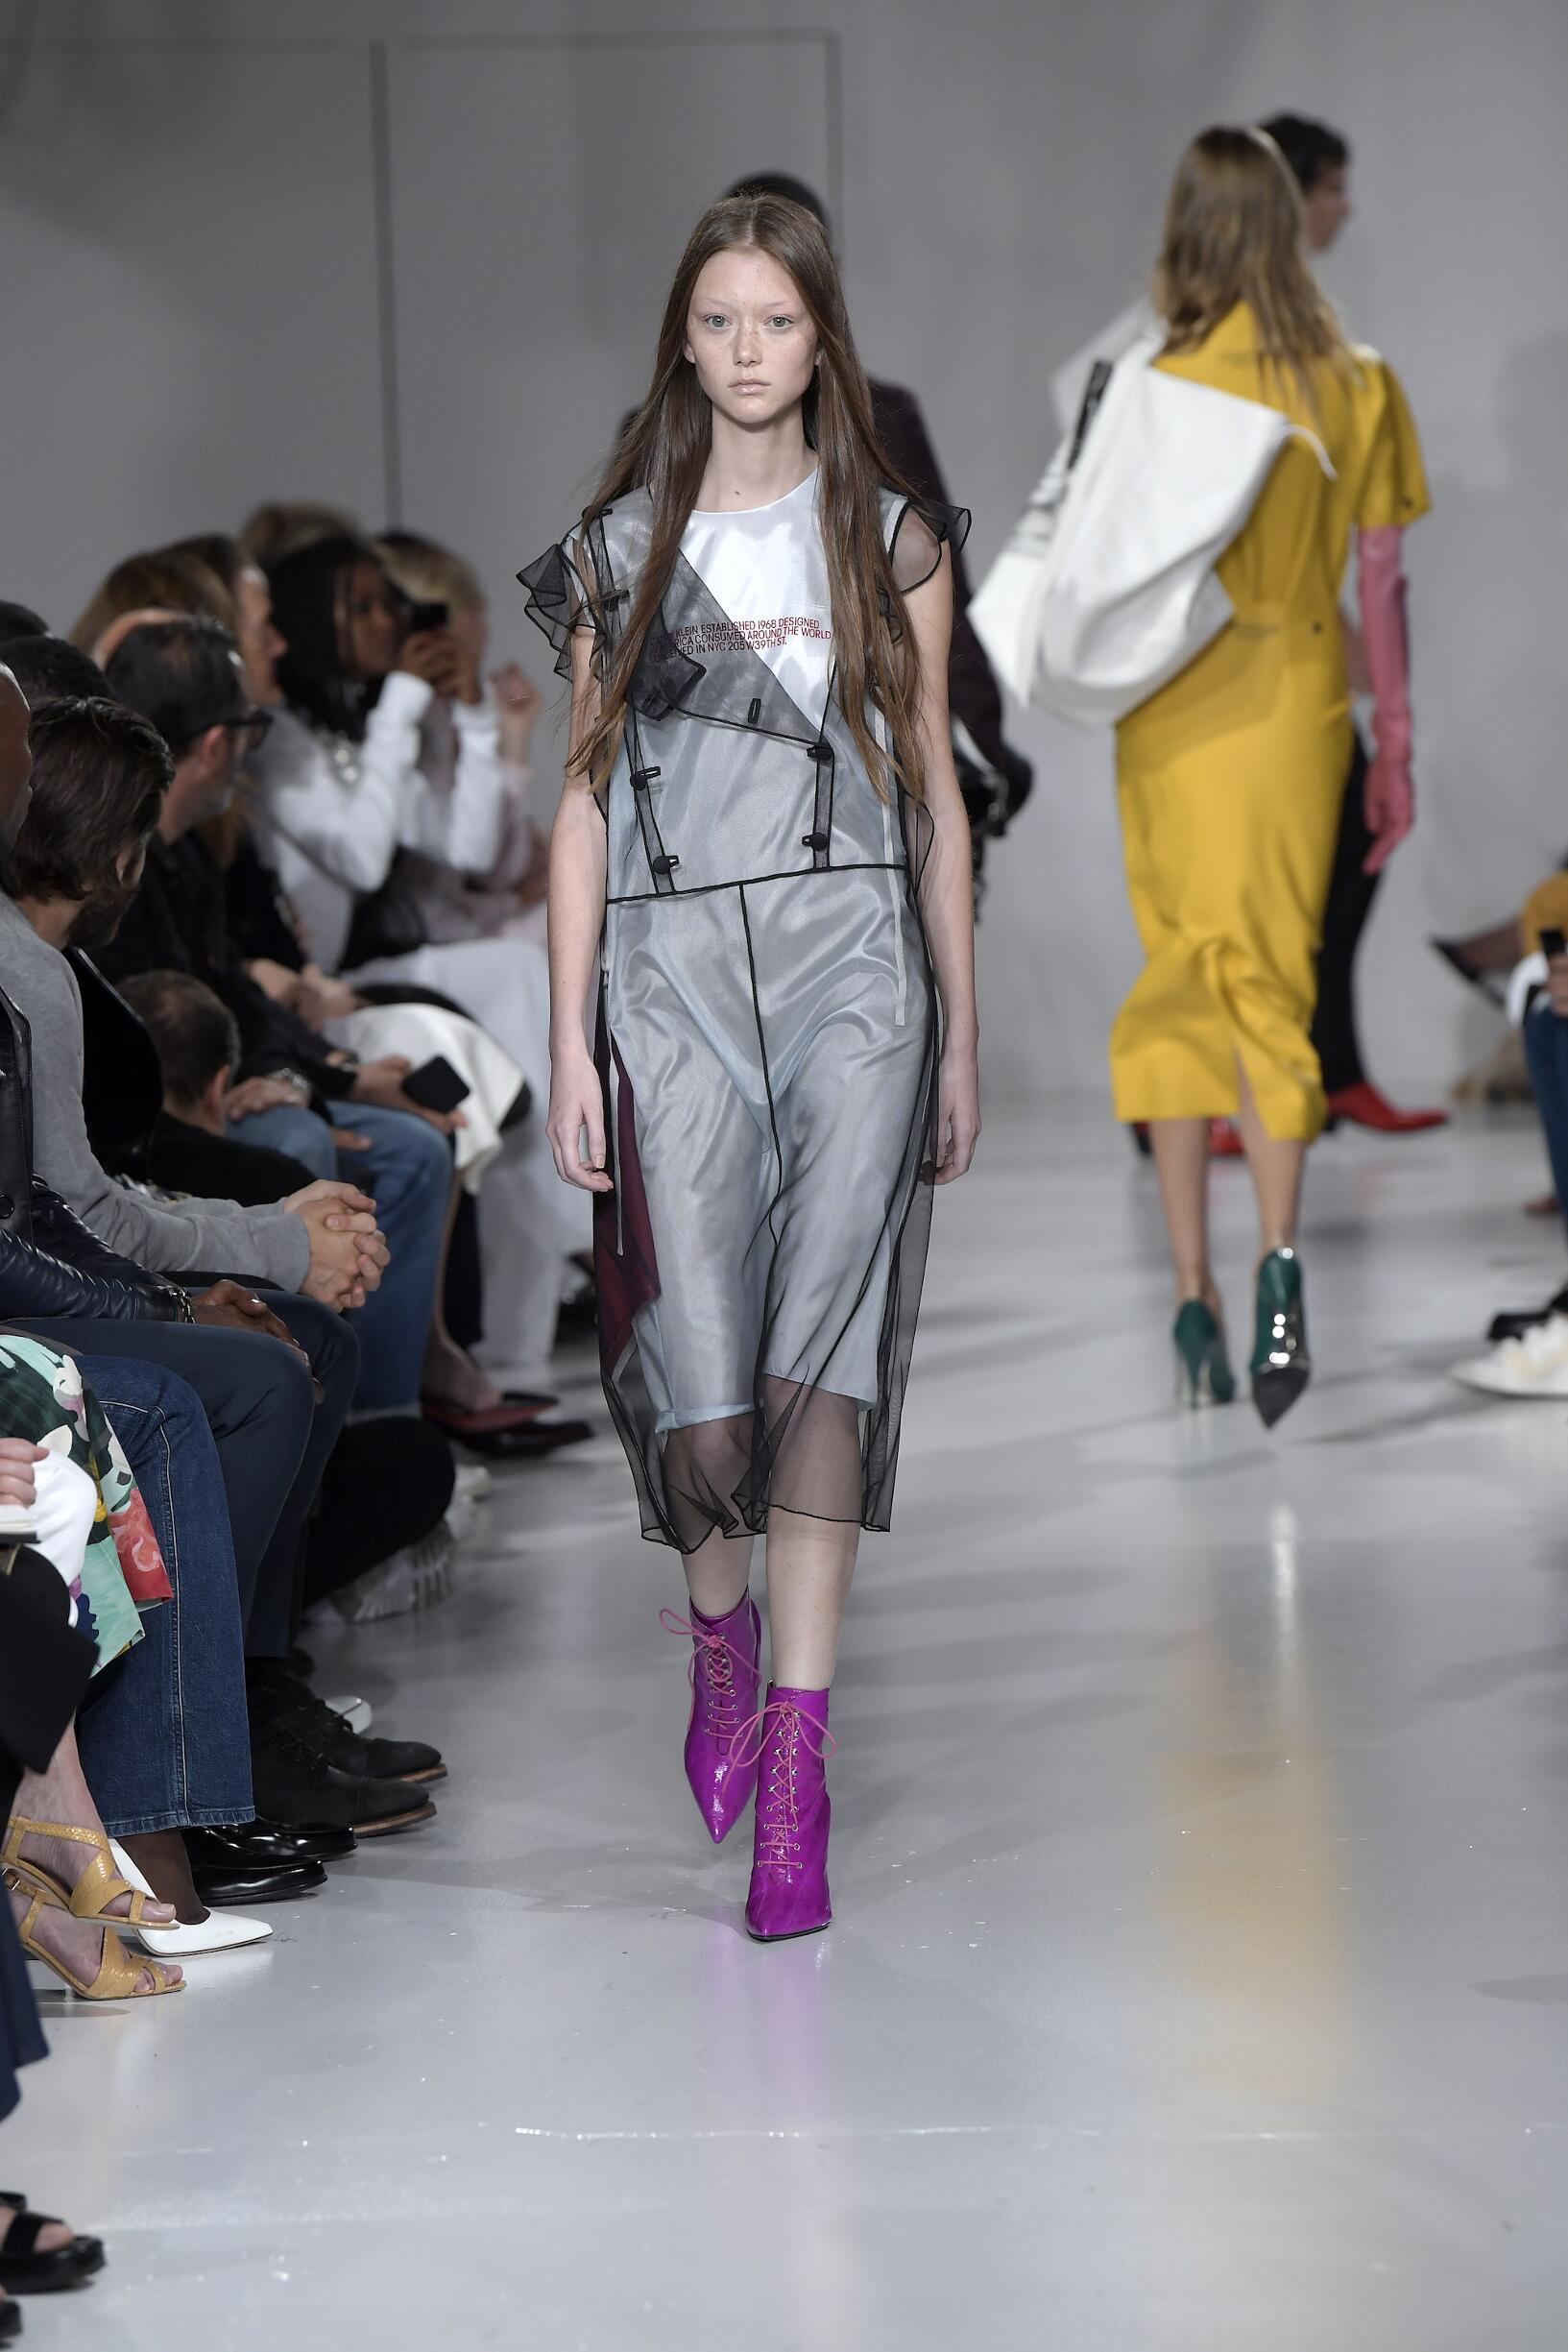 Fashion 2018 Runway Calvin Klein 205W39NYC SS